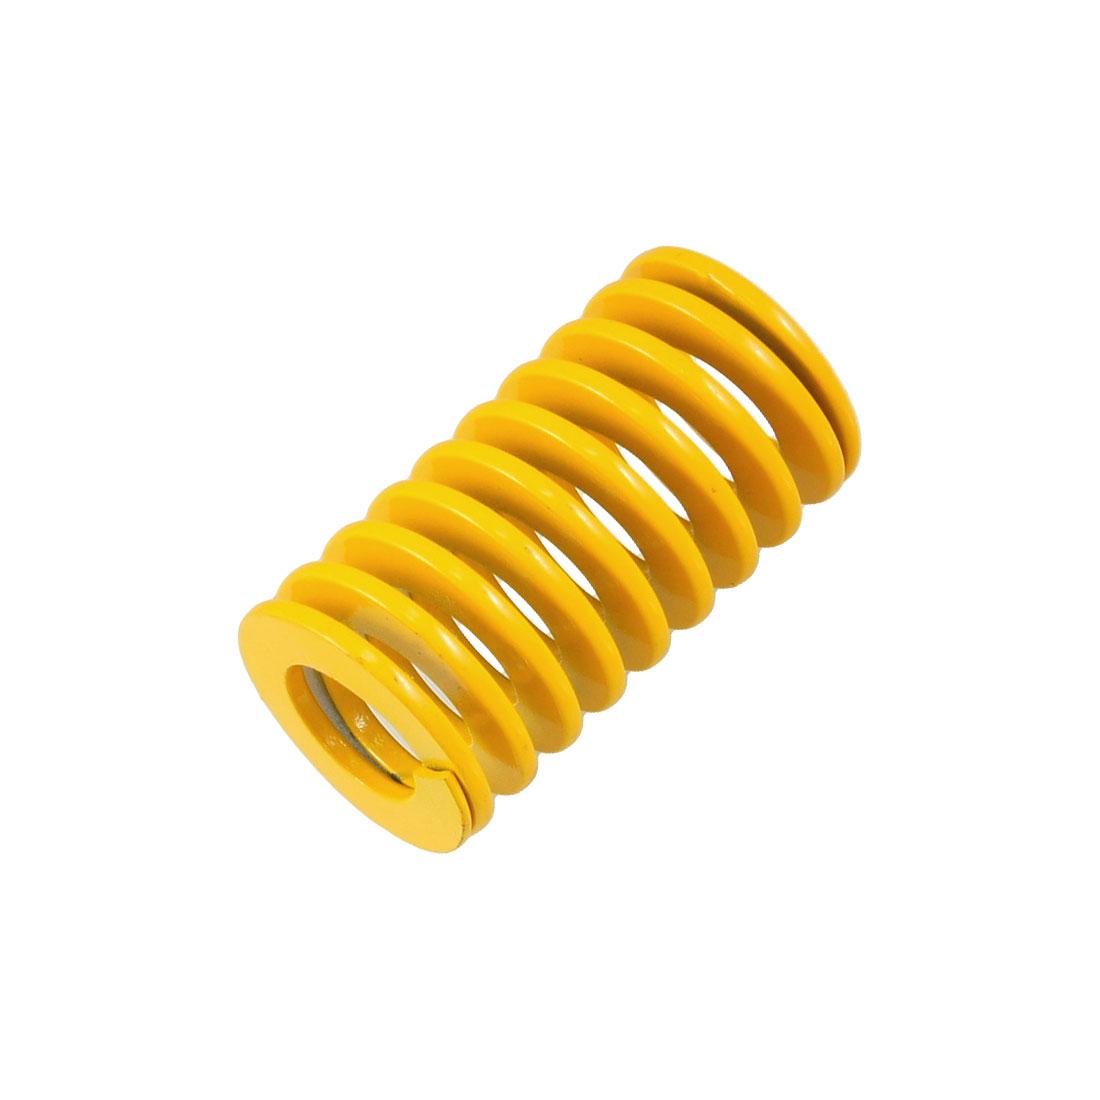 Orange 30mm x 16.5mm x 55mm Metal Tubular Section Mould Die Spring